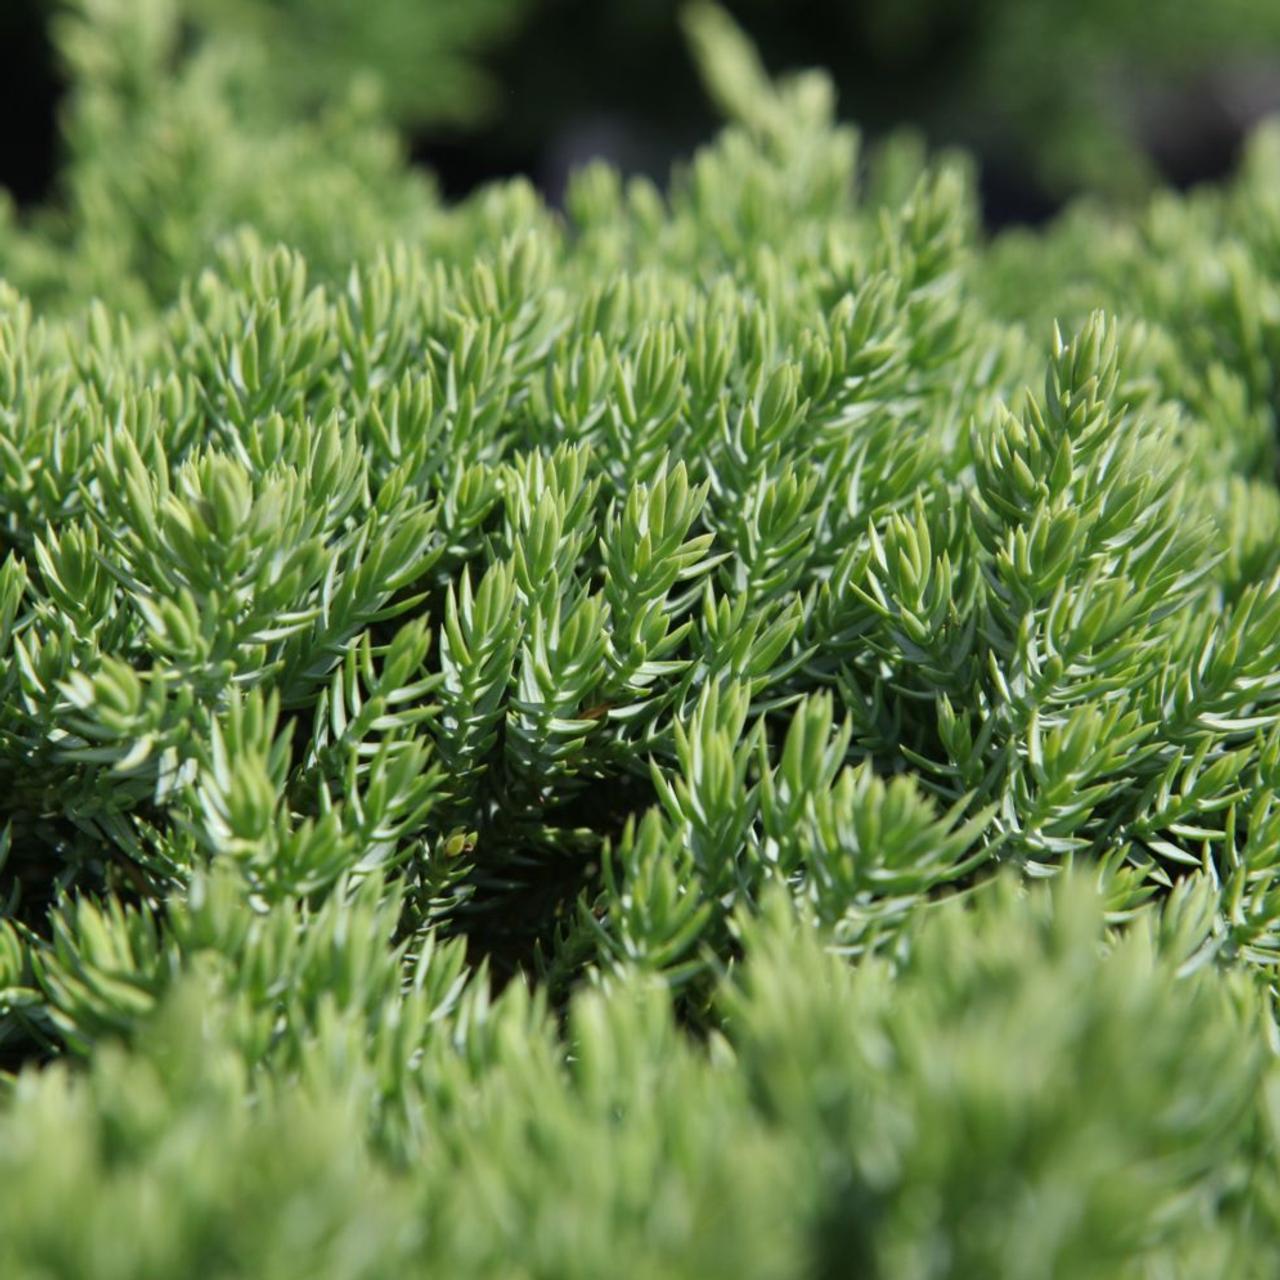 Juniperus procumbens 'Nana' plant